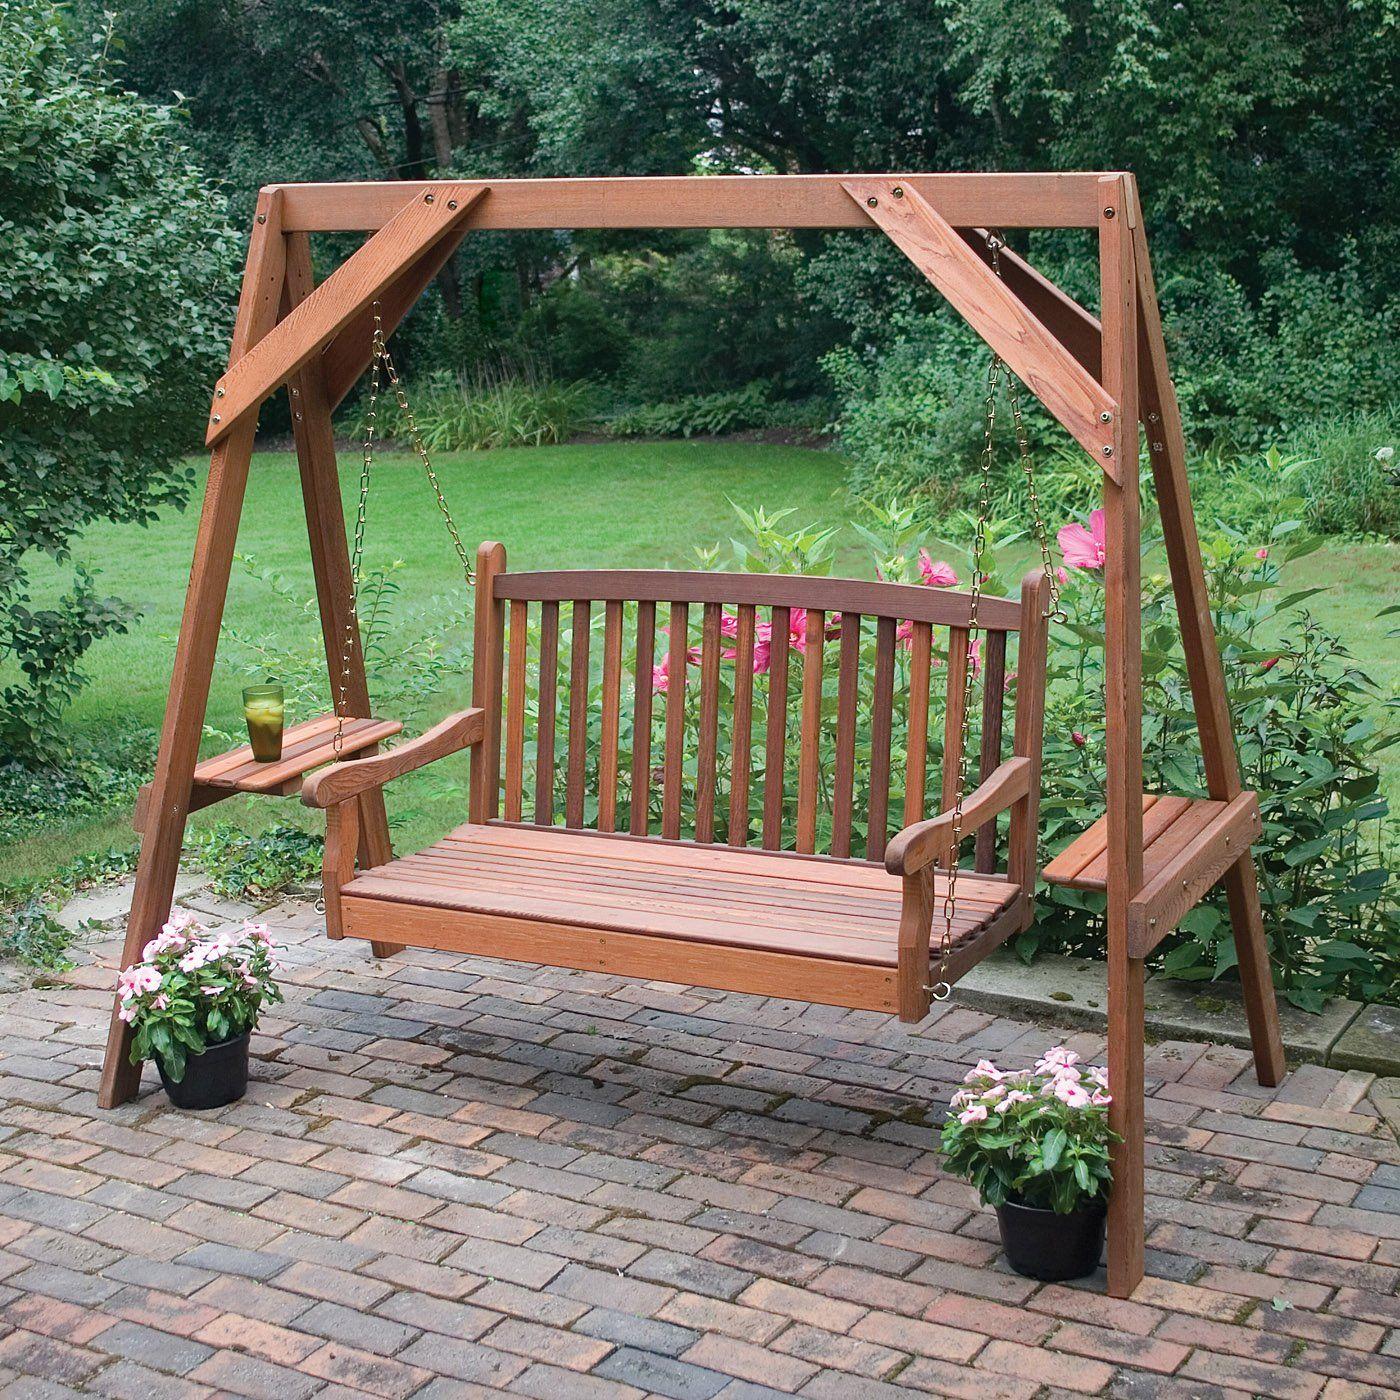 Swing For Backyard With Side Tables Balancos De Madeira